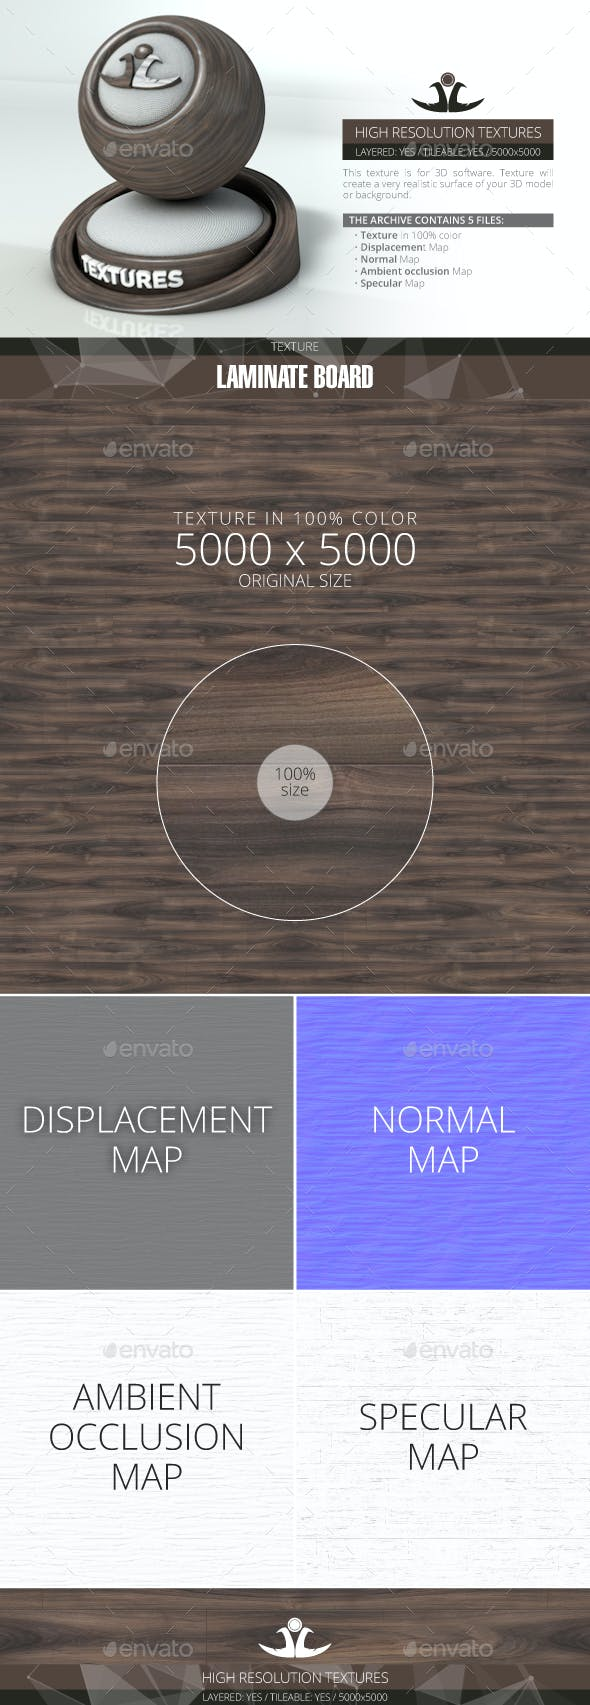 Laminate Board 23 - 3DOcean Item for Sale